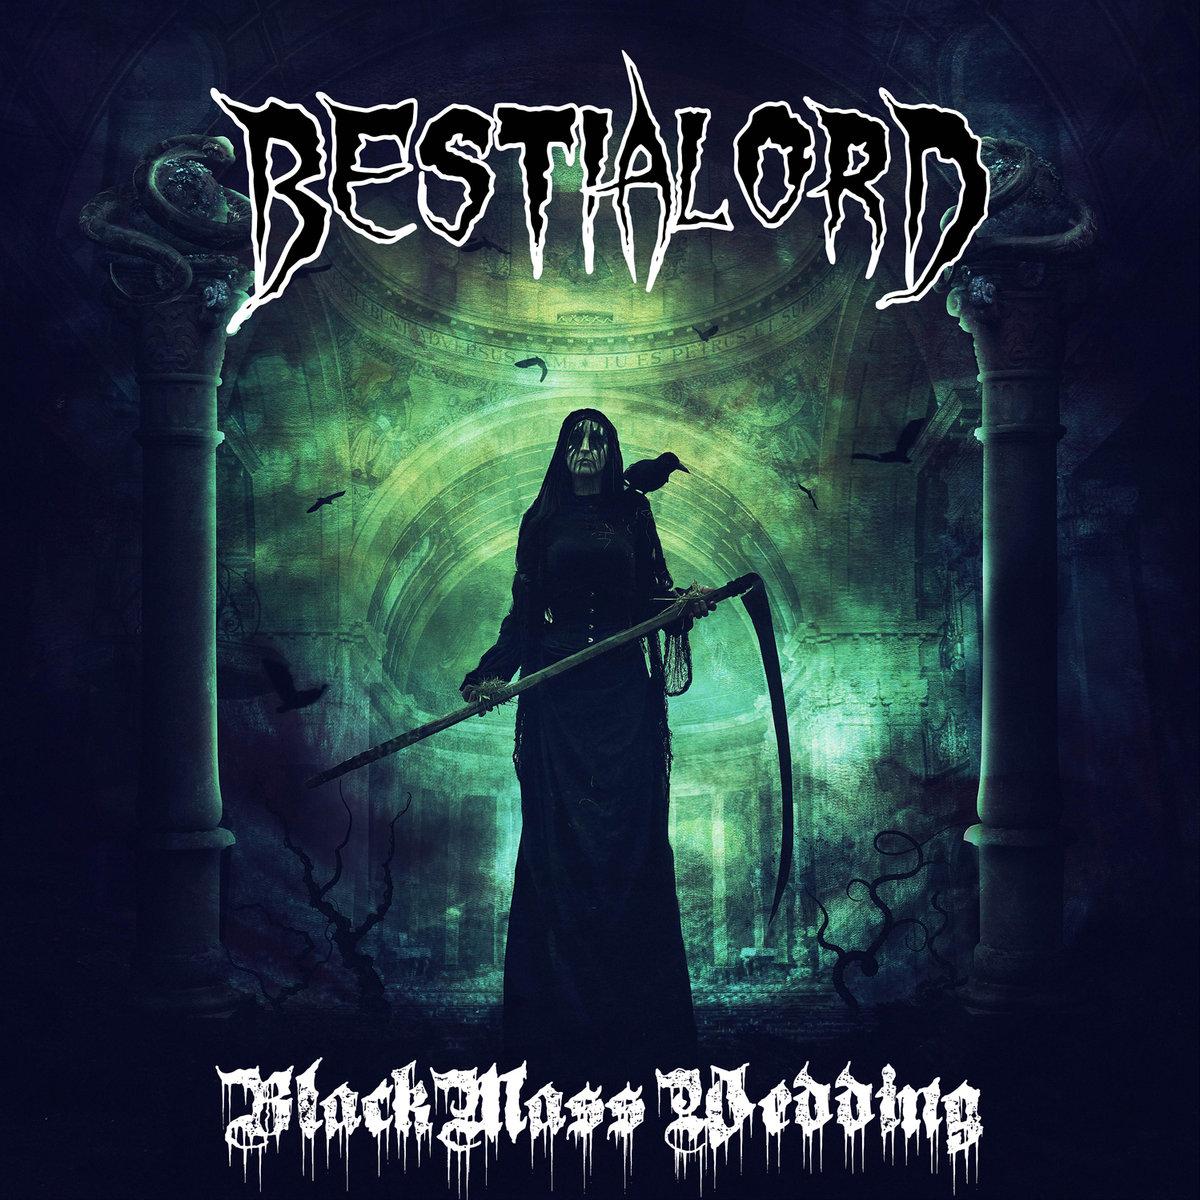 bestialord – black mass wedding